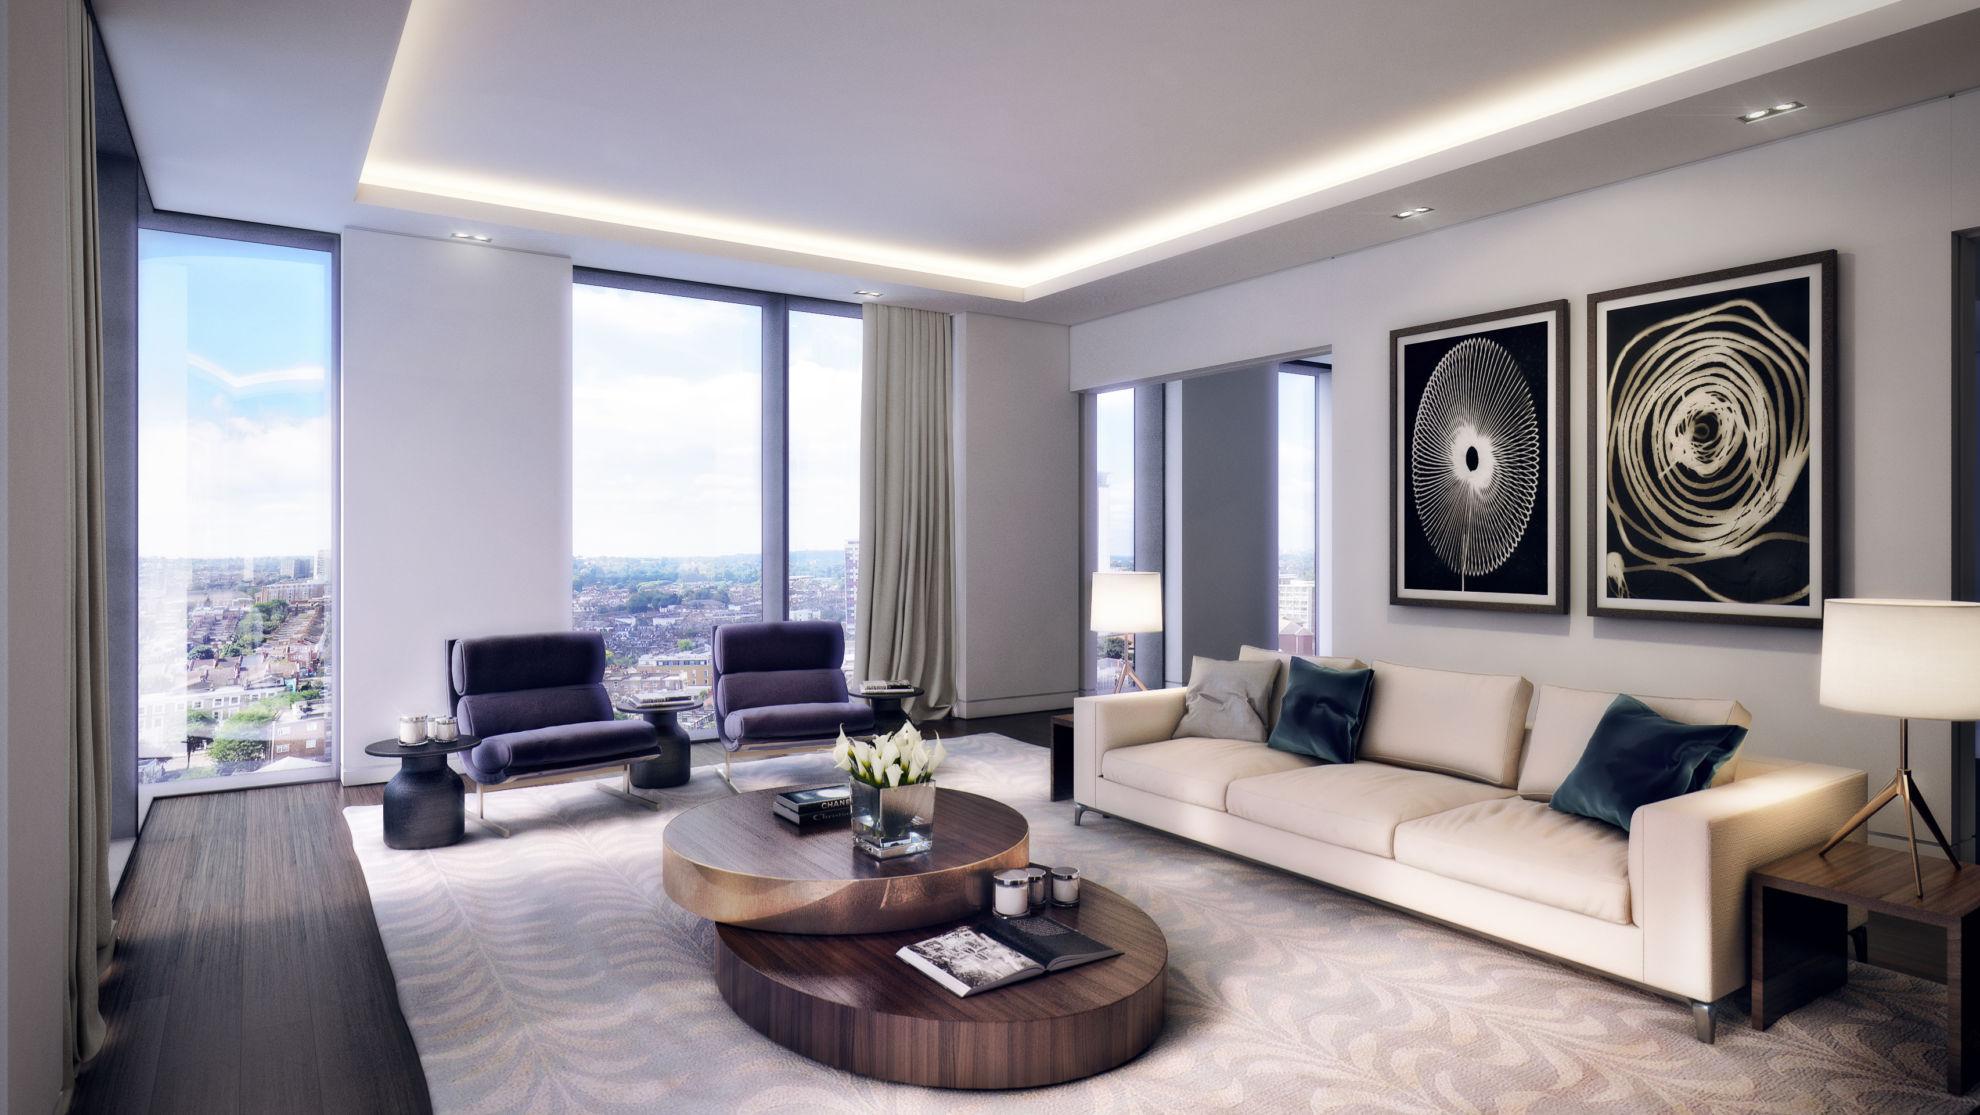 ... Unit number: 808 Units; 7.4 acre property; Scope: Interior design, 3D  visualisation, clubhouse procurement, wayfinding and signage, marketing  plans, ...